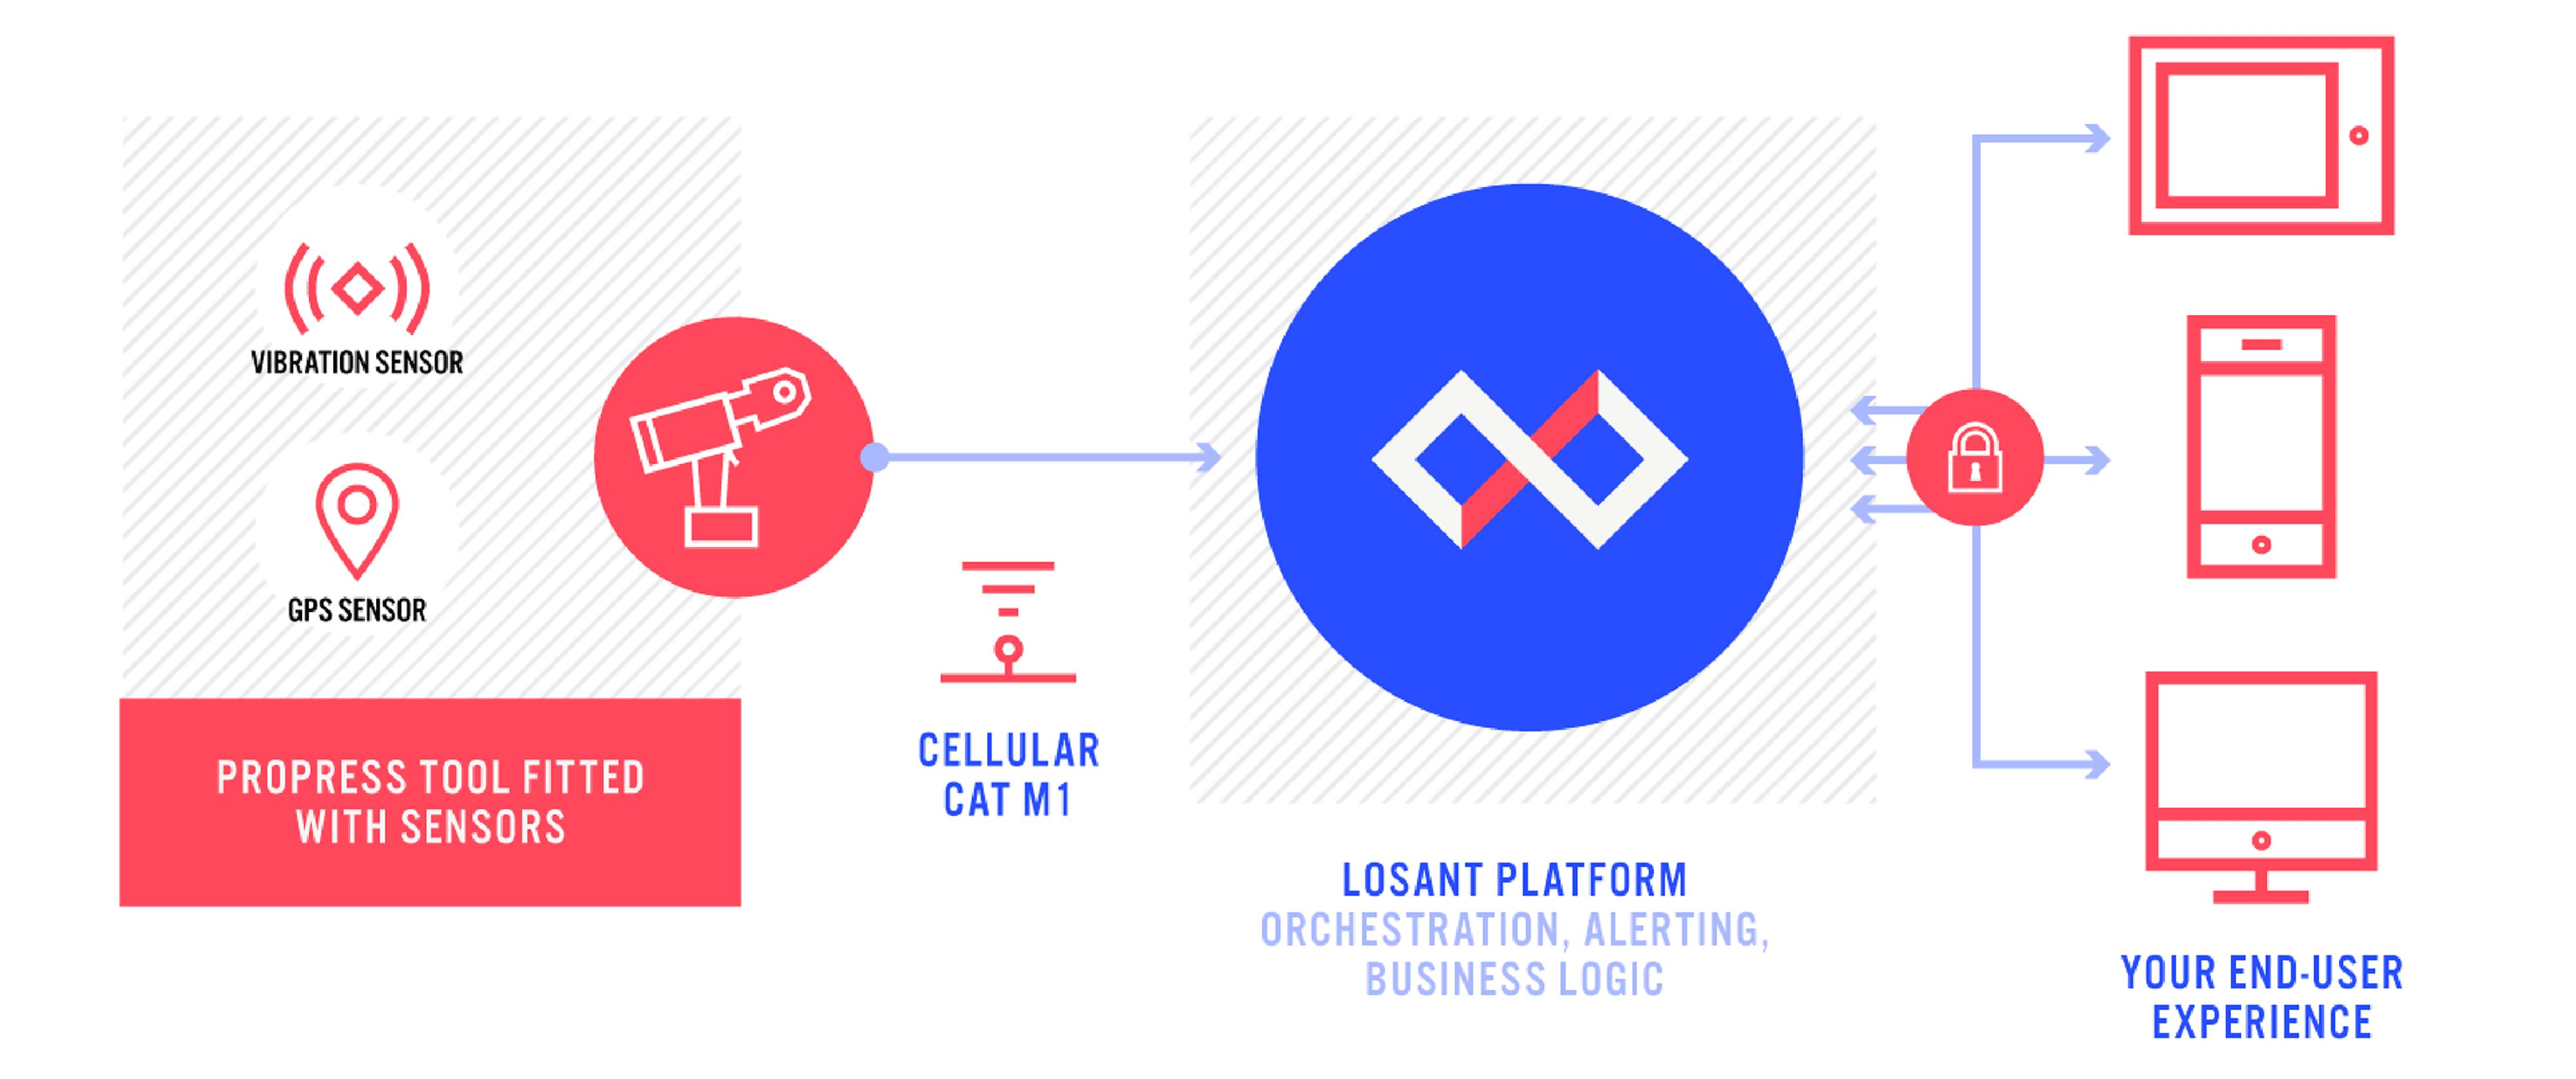 LosantGuide-G2M-infographic-4